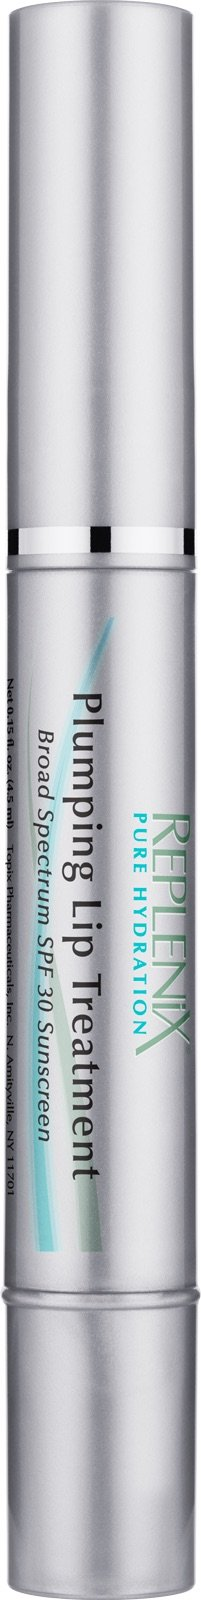 Replenix Lip Plumping Treatment Hydrates, Plumps and Protects - Lip Plumper by Replenix (Image #1)